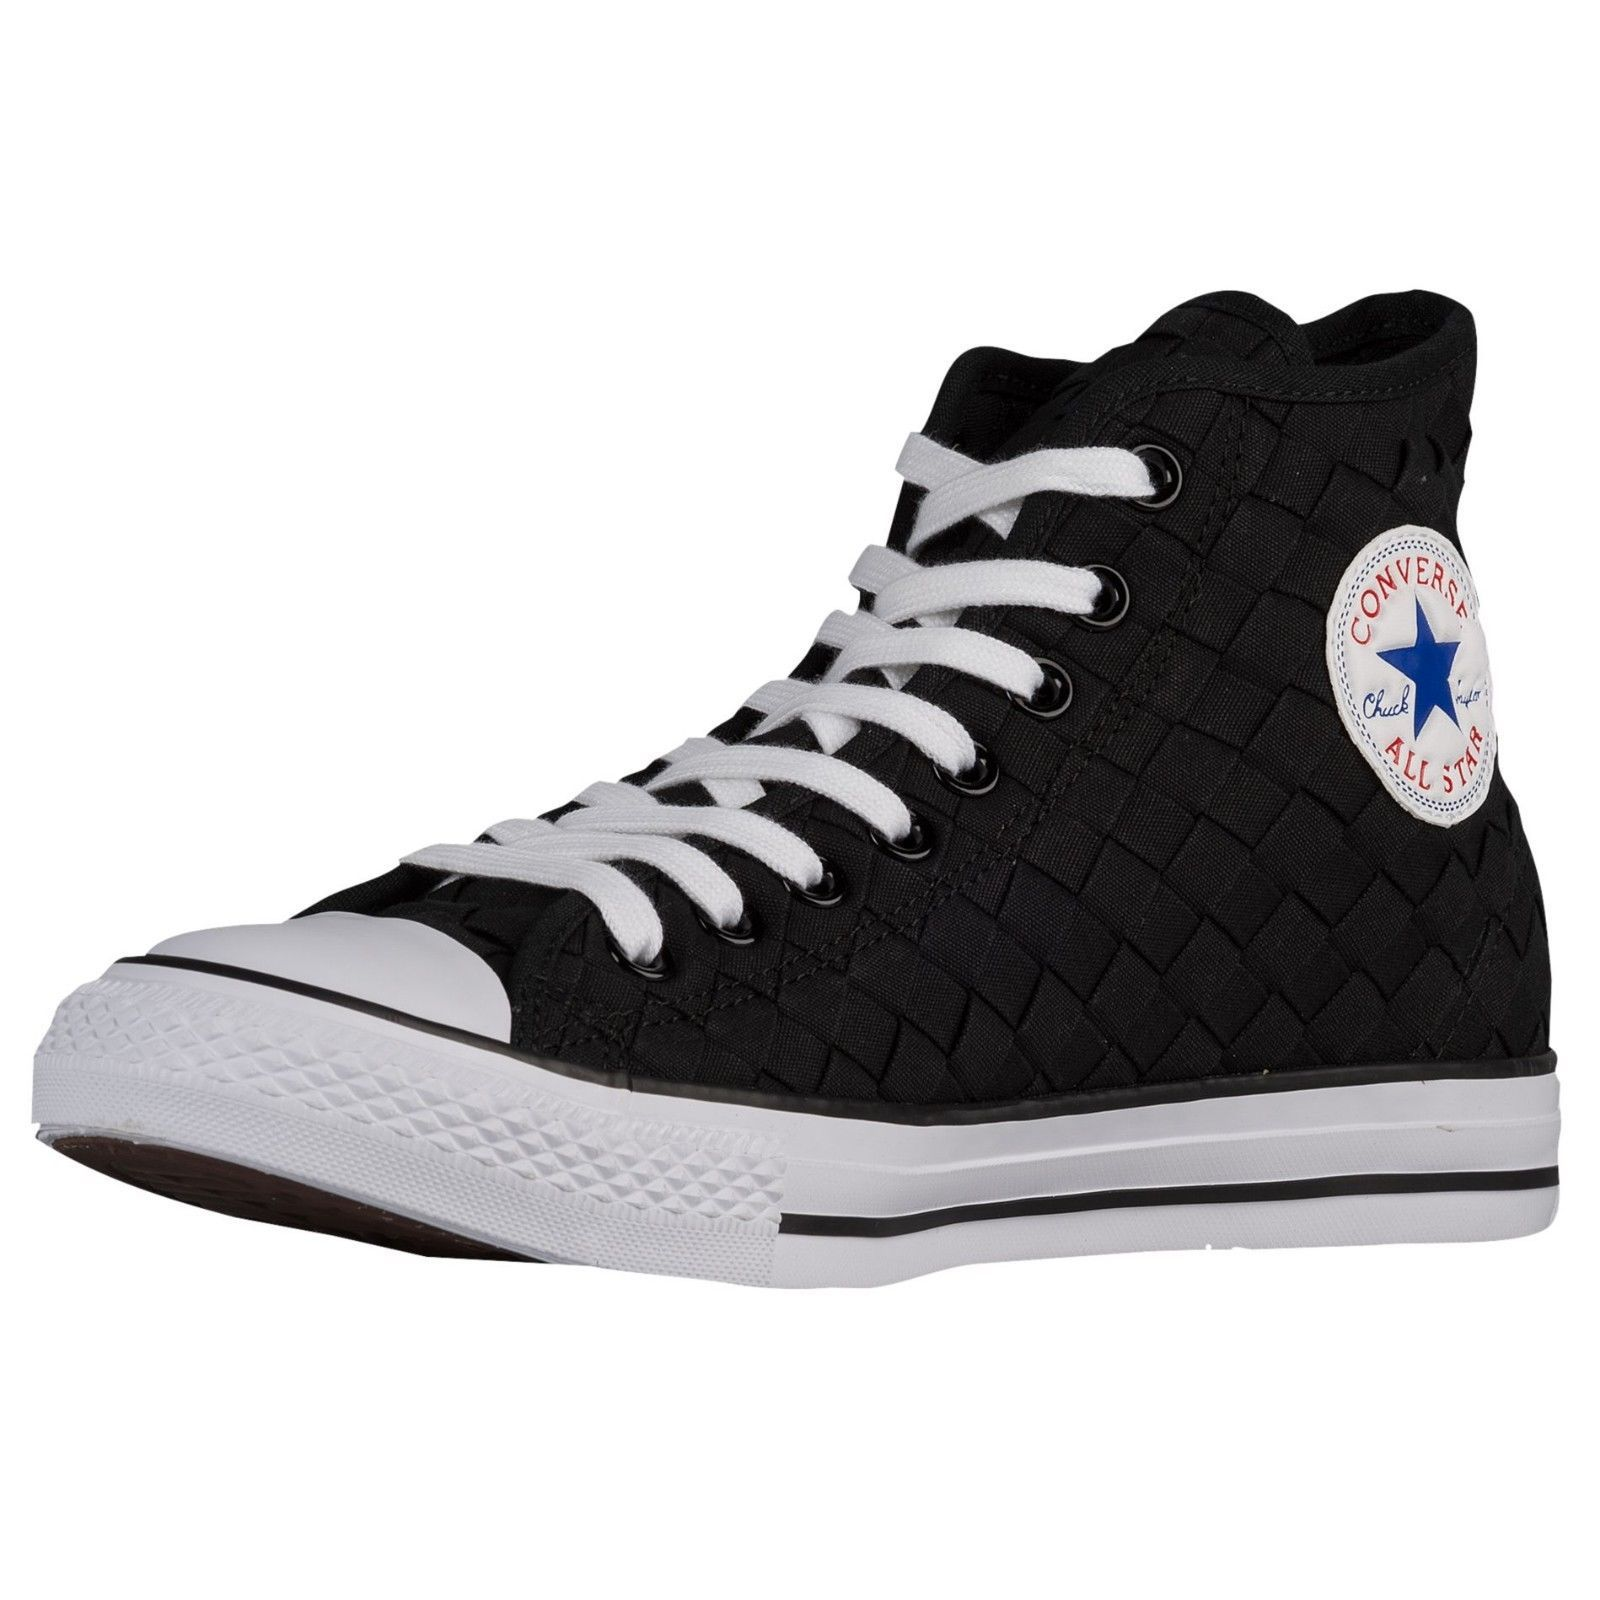 c70d6bbfe6f3 New Men's - Women's Converse Chuck Taylor Hi Woven Athletic Shoes Sz 10 /  12 - $39.55